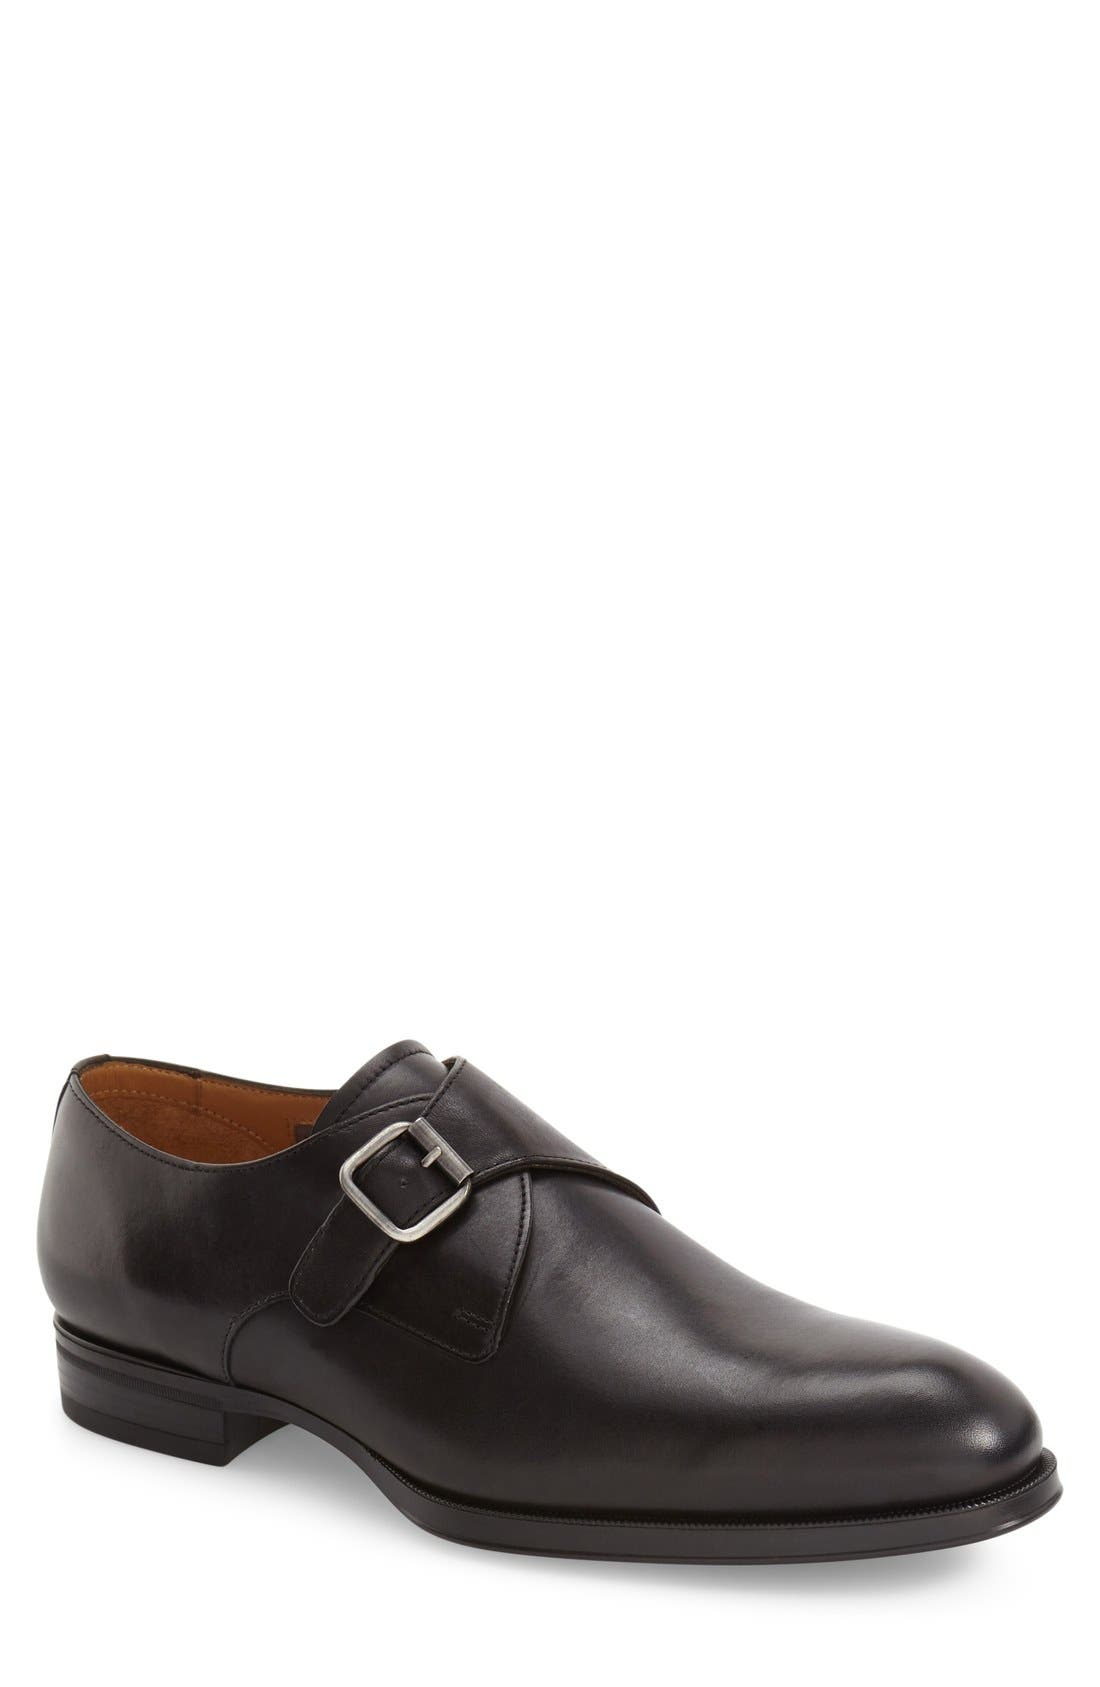 Alternate Image 1 Selected - Vince Camuto 'Trifolo' Monk Strap Shoe (Men)